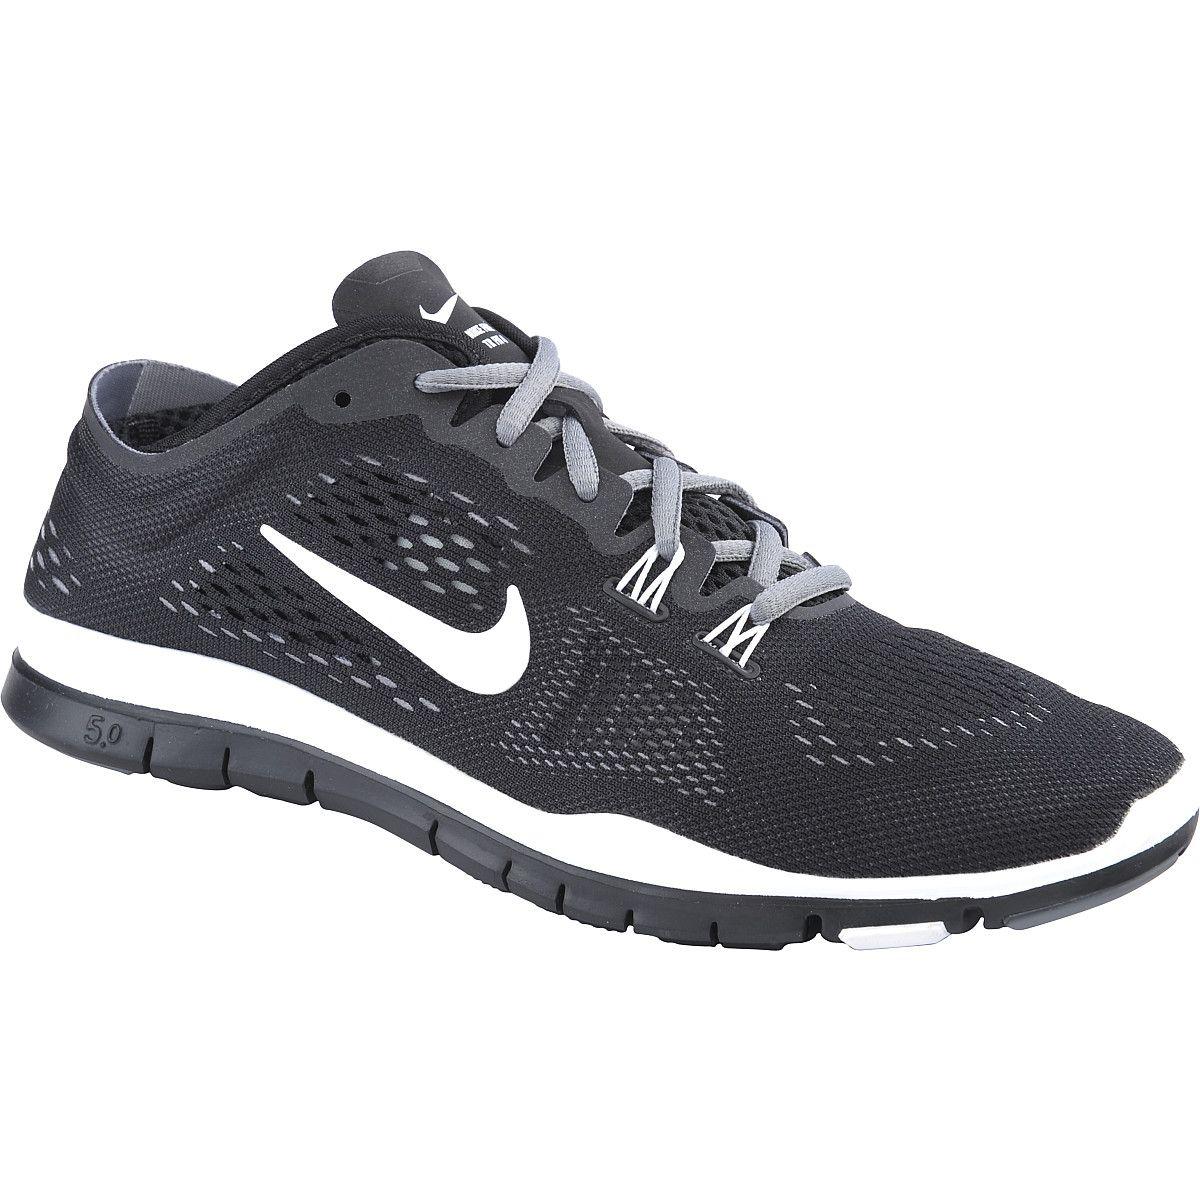 newest b3de0 fb359 NIKE Women's Free 5.0 TR Fit 4 Breathe Cross-Training Shoes ...